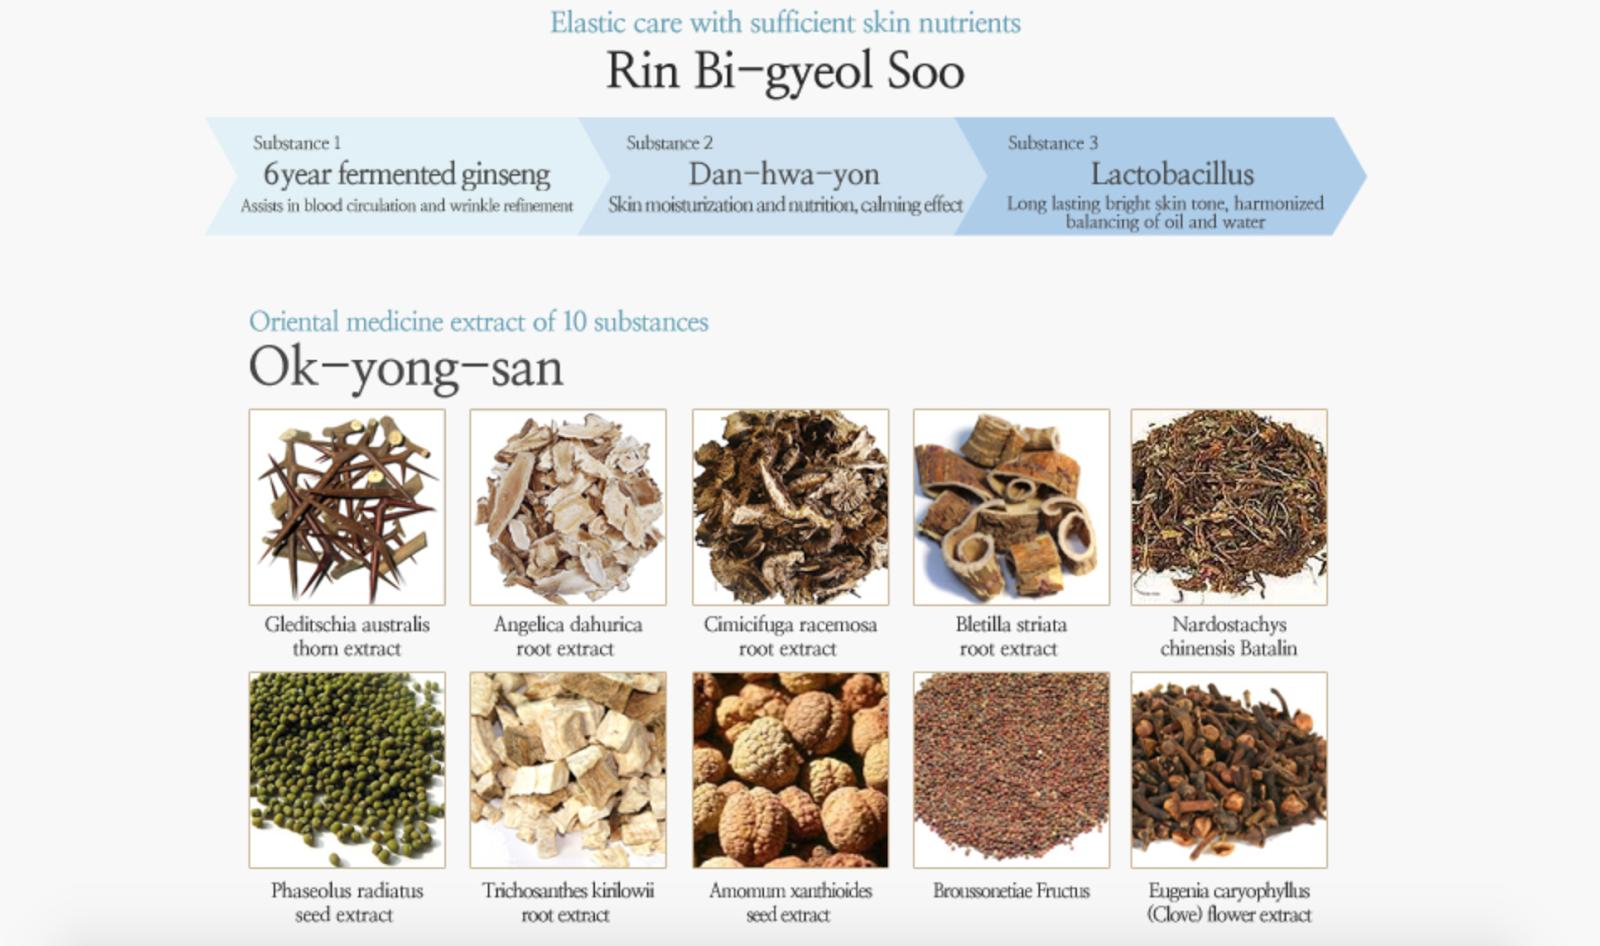 Hansaeng Cosmetics RIN Bi-gyeol Soo Essence Review